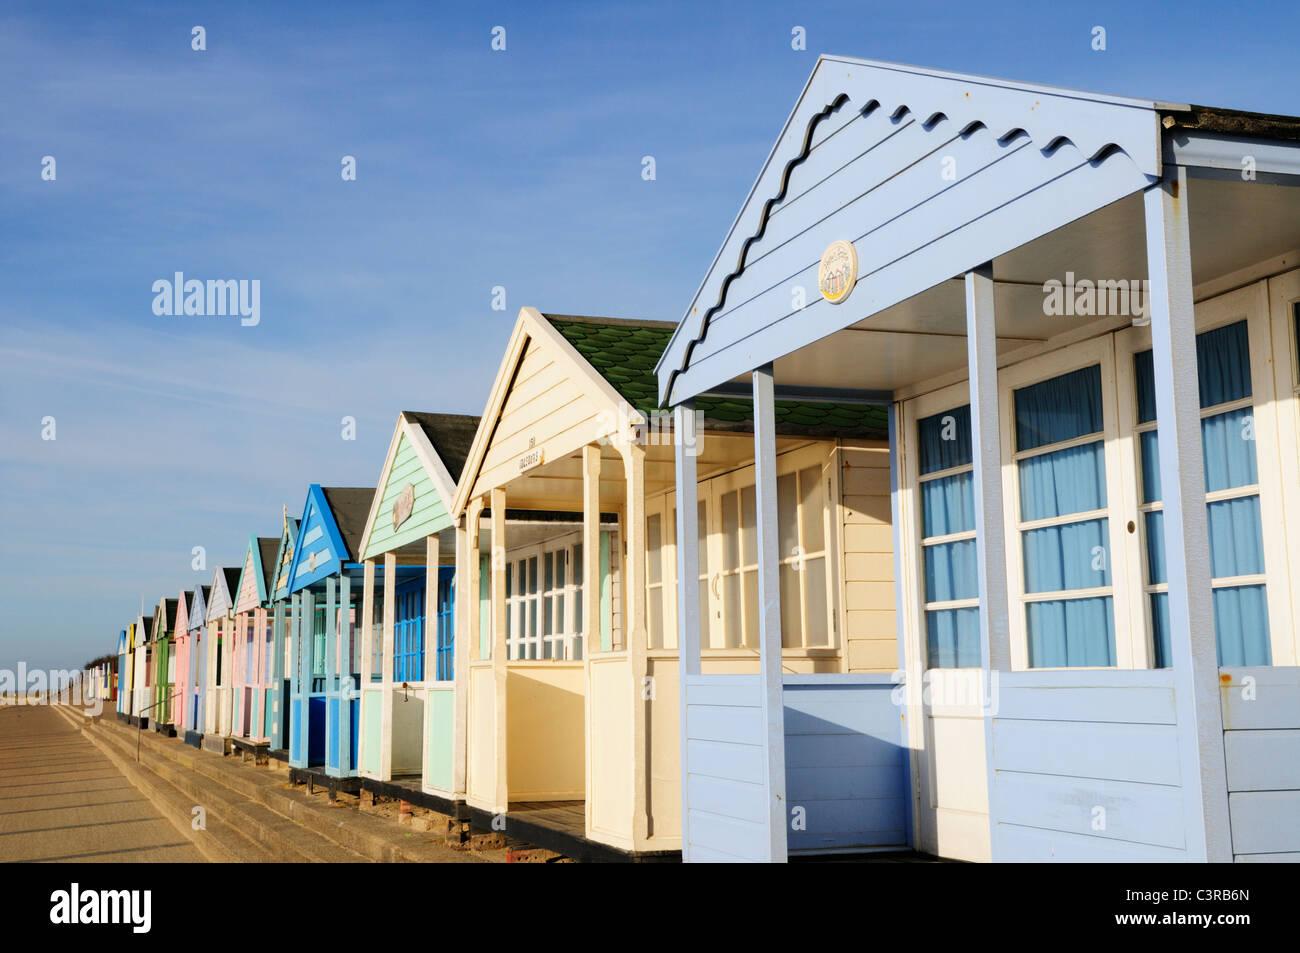 Beach Huts at Southwold, Suffolk, England, UK - Stock Image